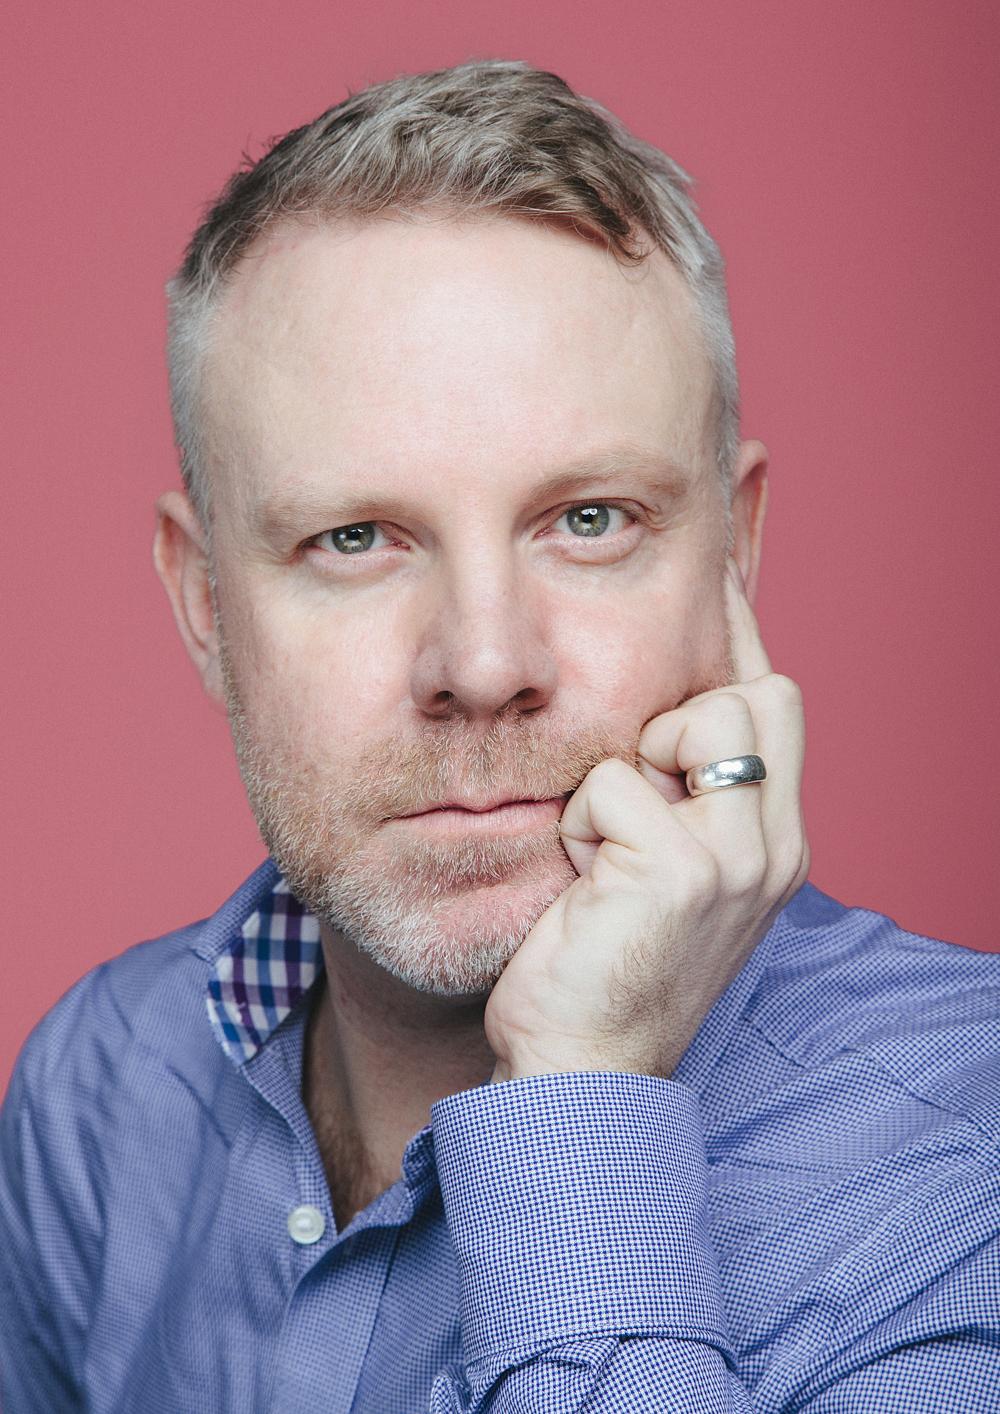 Chogm-Queer-Commonwealth-Eivind-Hansen--5.jpg